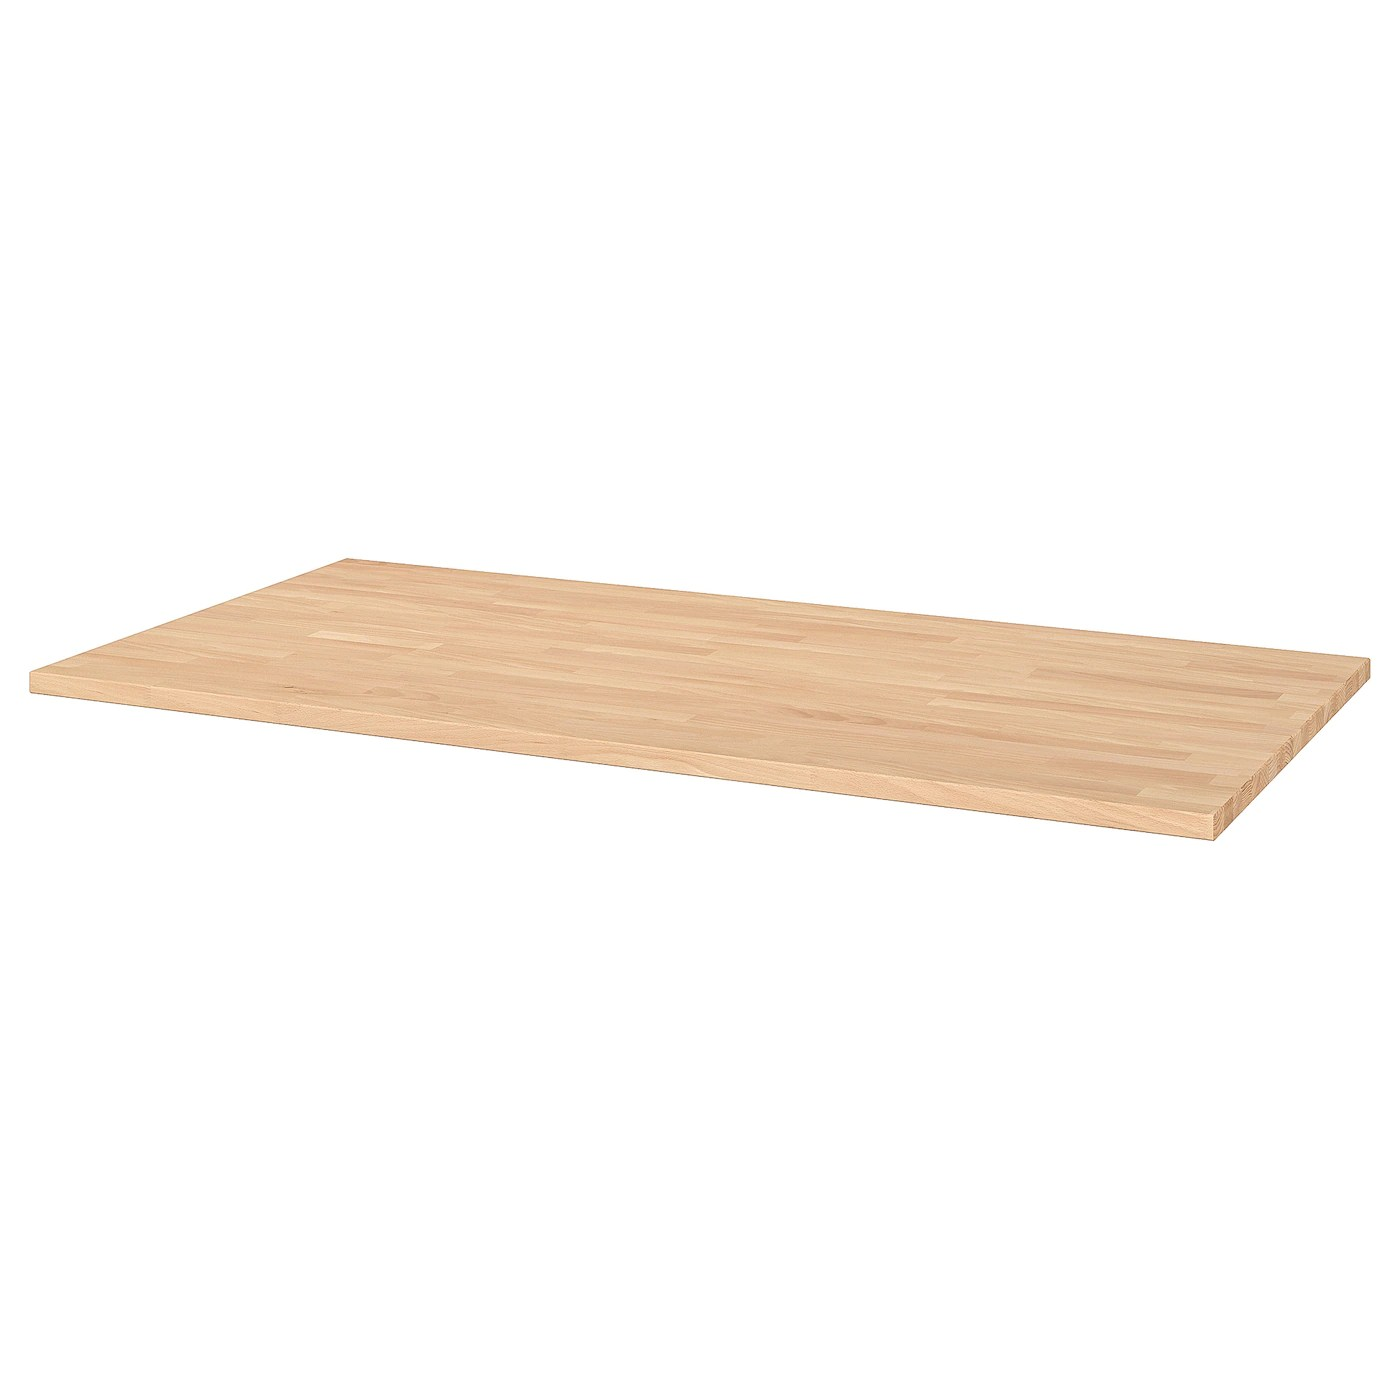 gerton tabletop beech 61x29 1 2